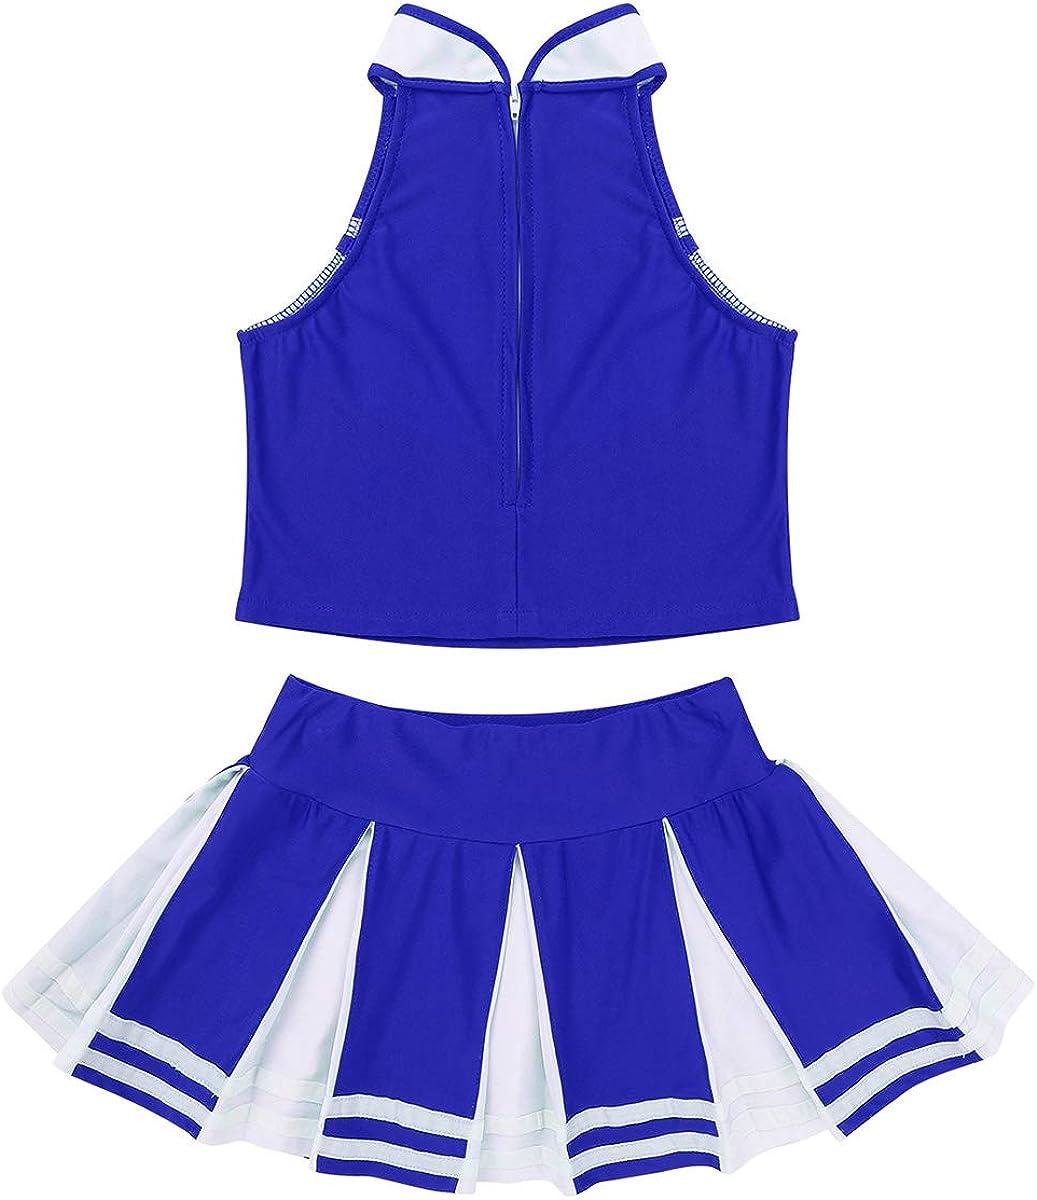 YUUMIN Kids Girls Cheerleading Outfit Sleeveless Tops with Pleated Skirt Set Costume